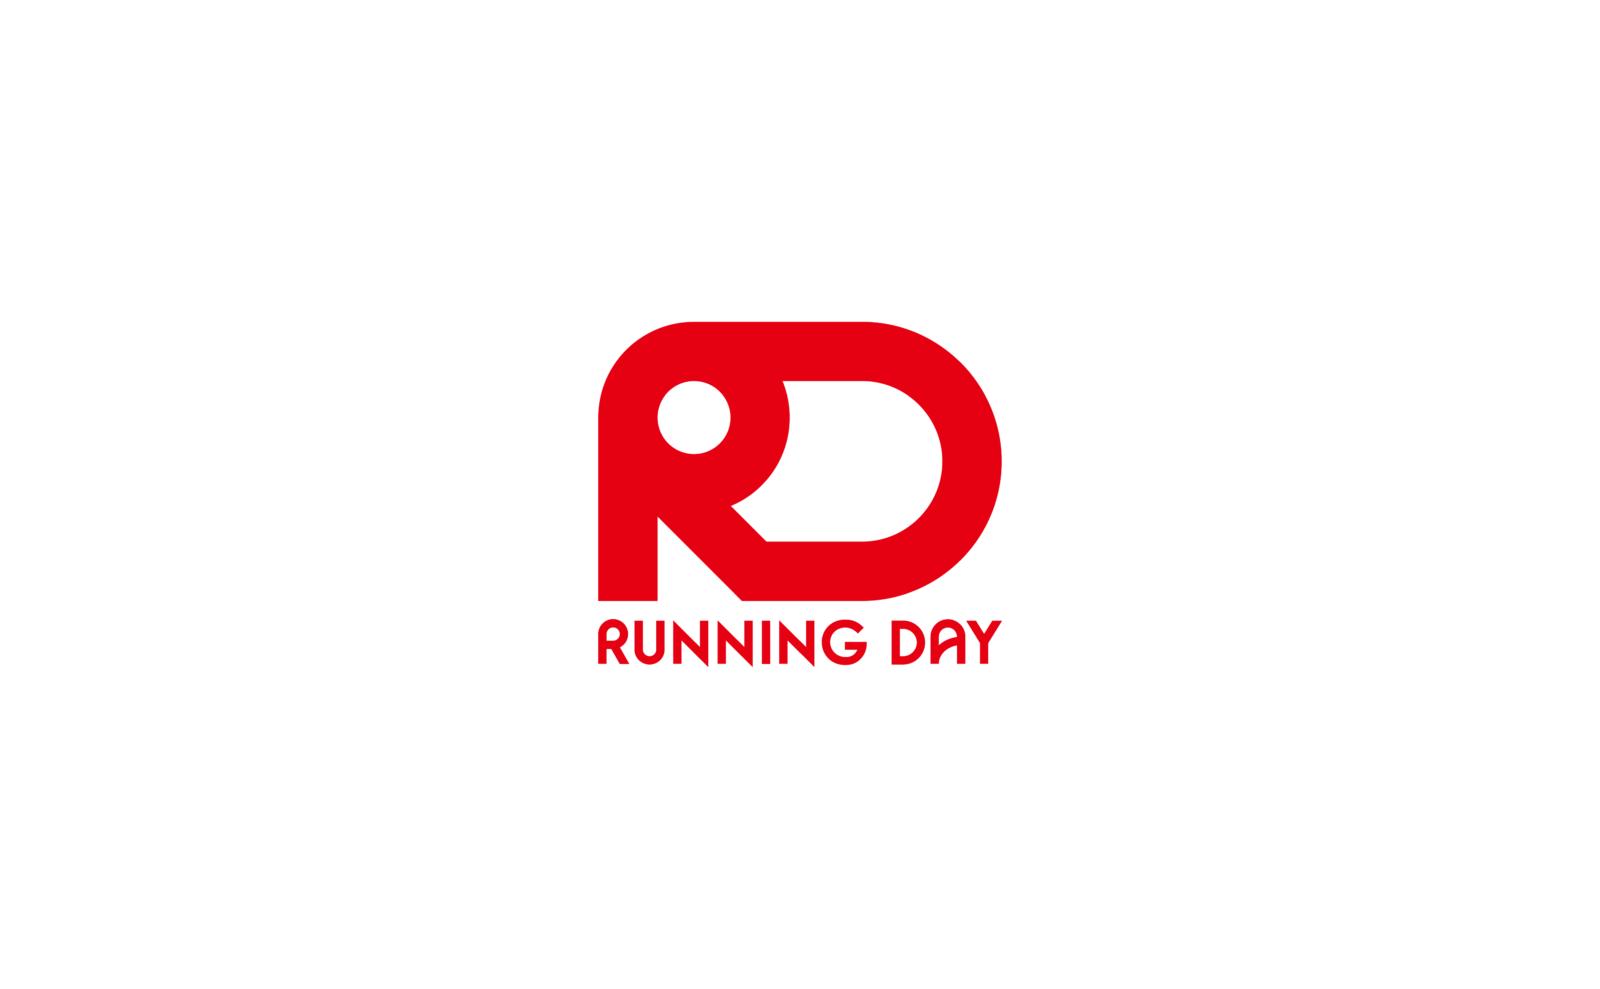 RUNNING DAY__-1